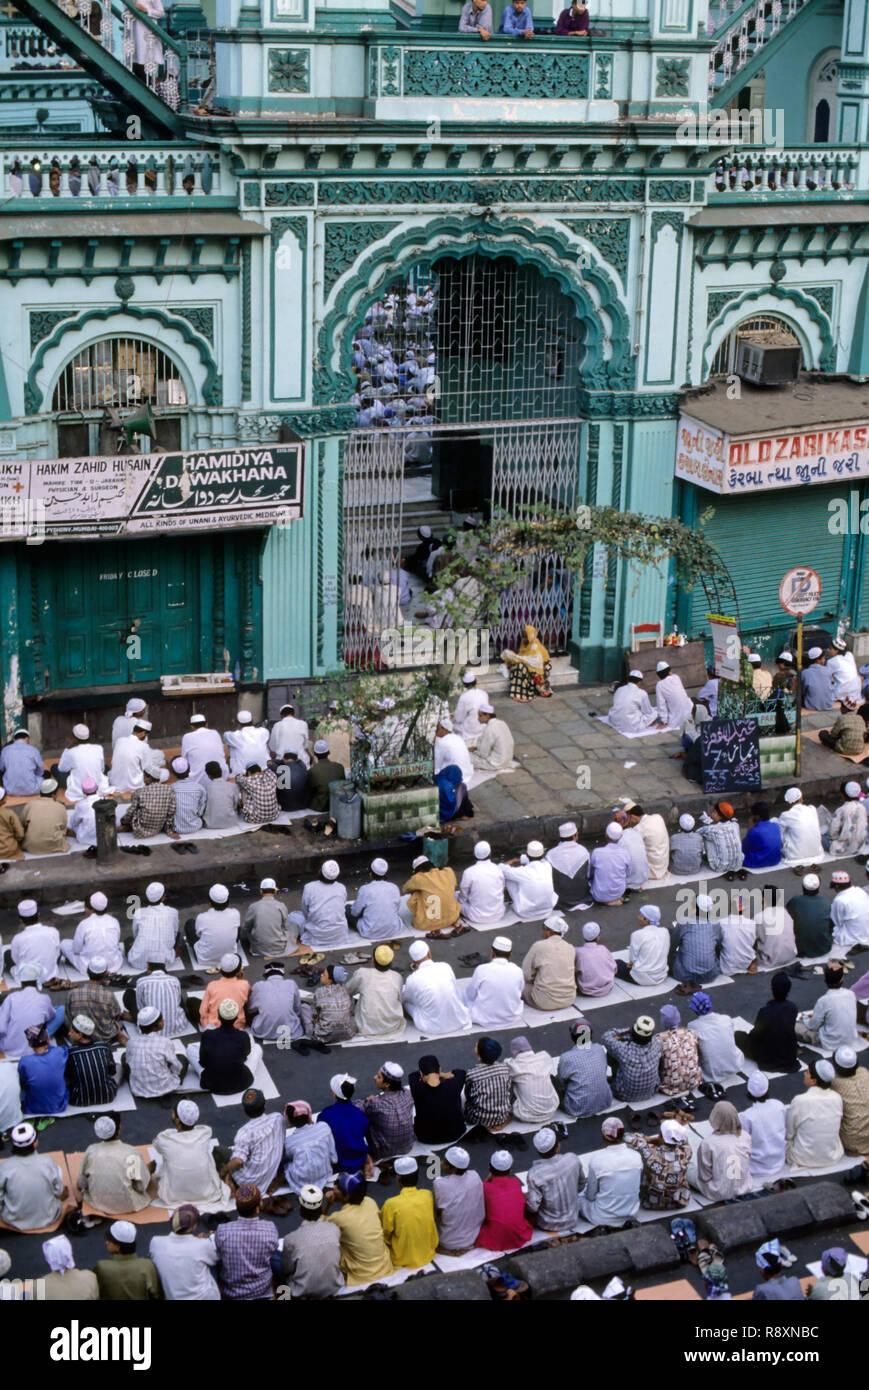 Muslims celebrating Ramzan Id - Stock Image